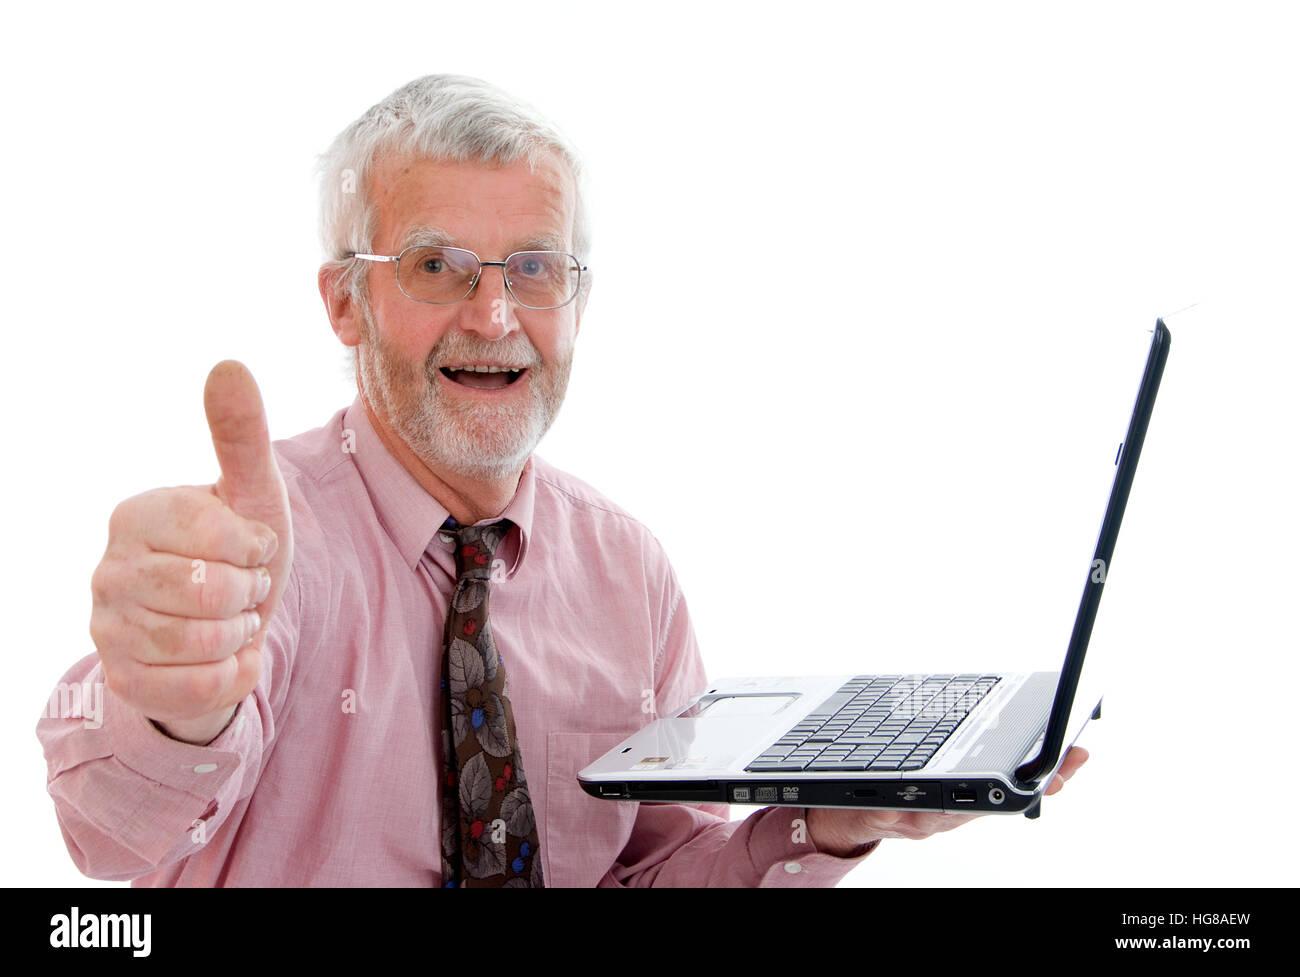 Retiree with laptop - Stock Image